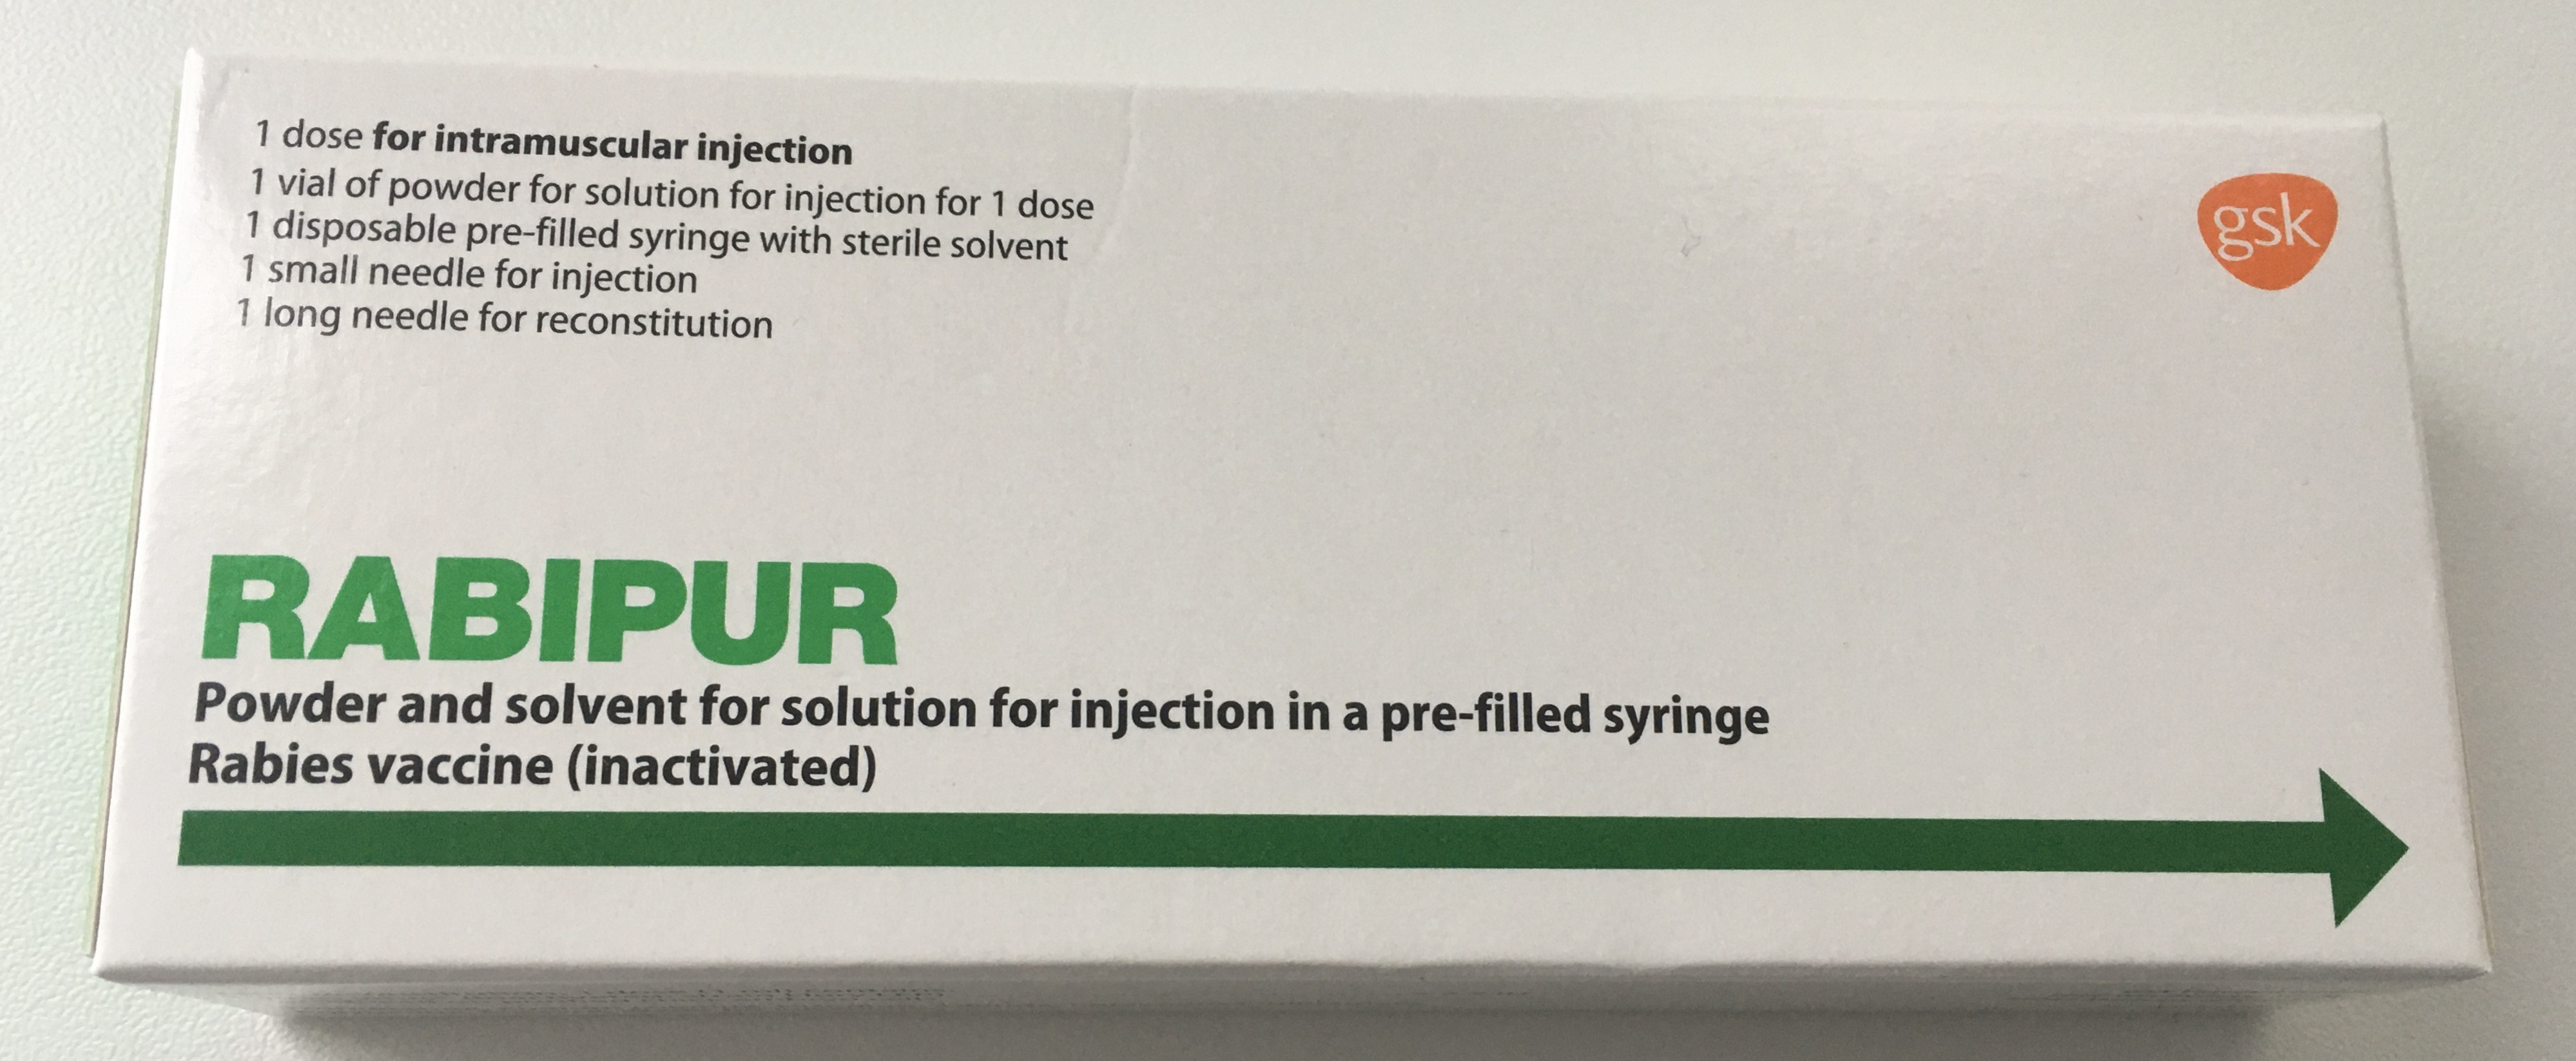 Rabipur Rabies Vaccine